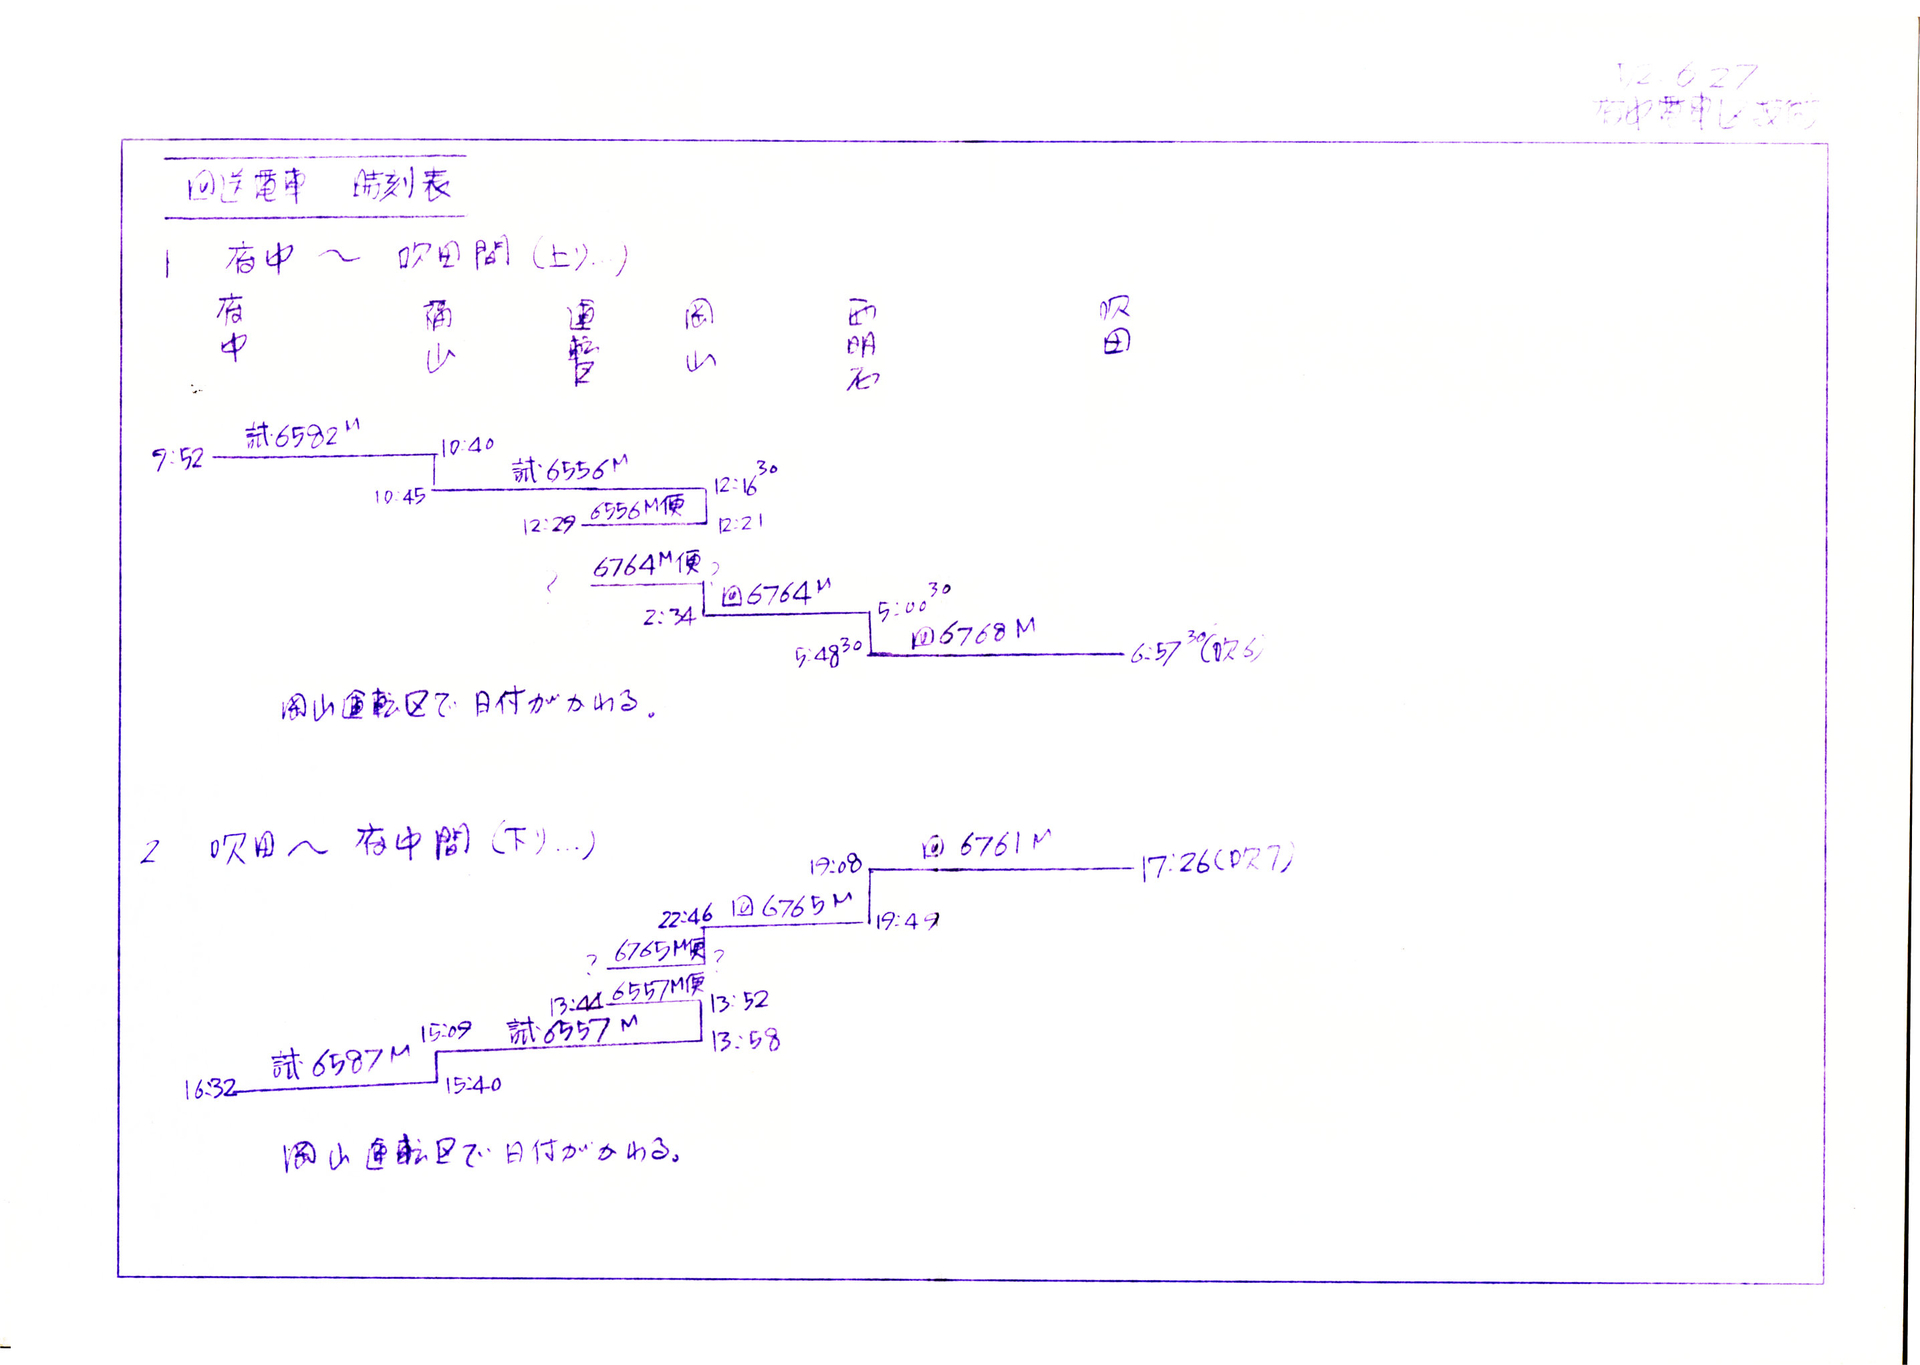 f:id:yasuo_ssi:20210328151213j:plain